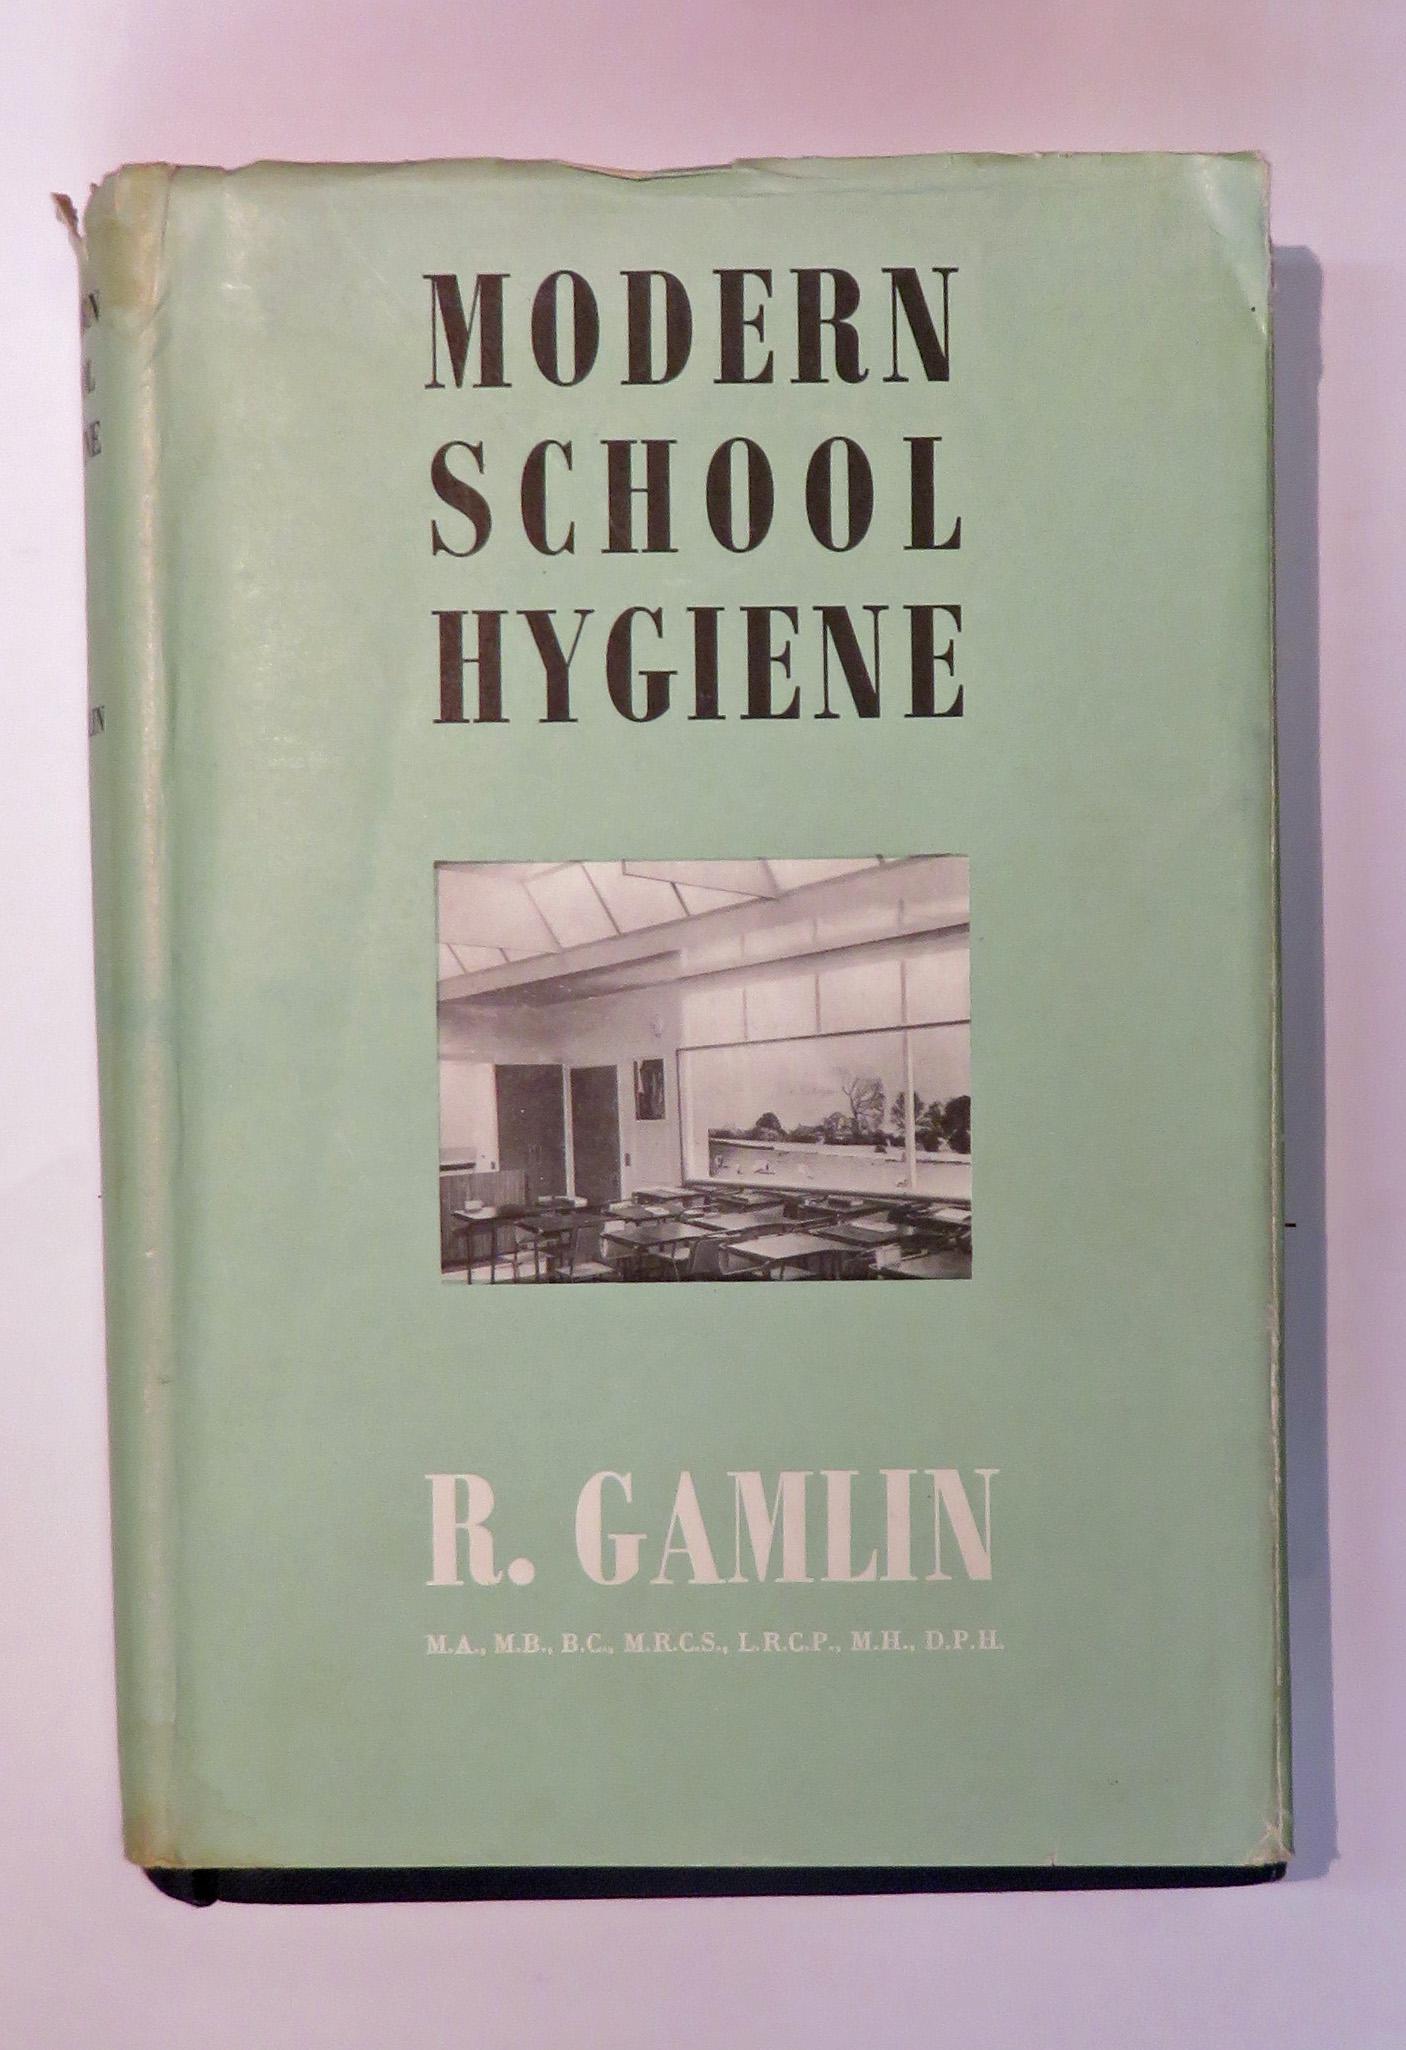 Modern School Hygiene